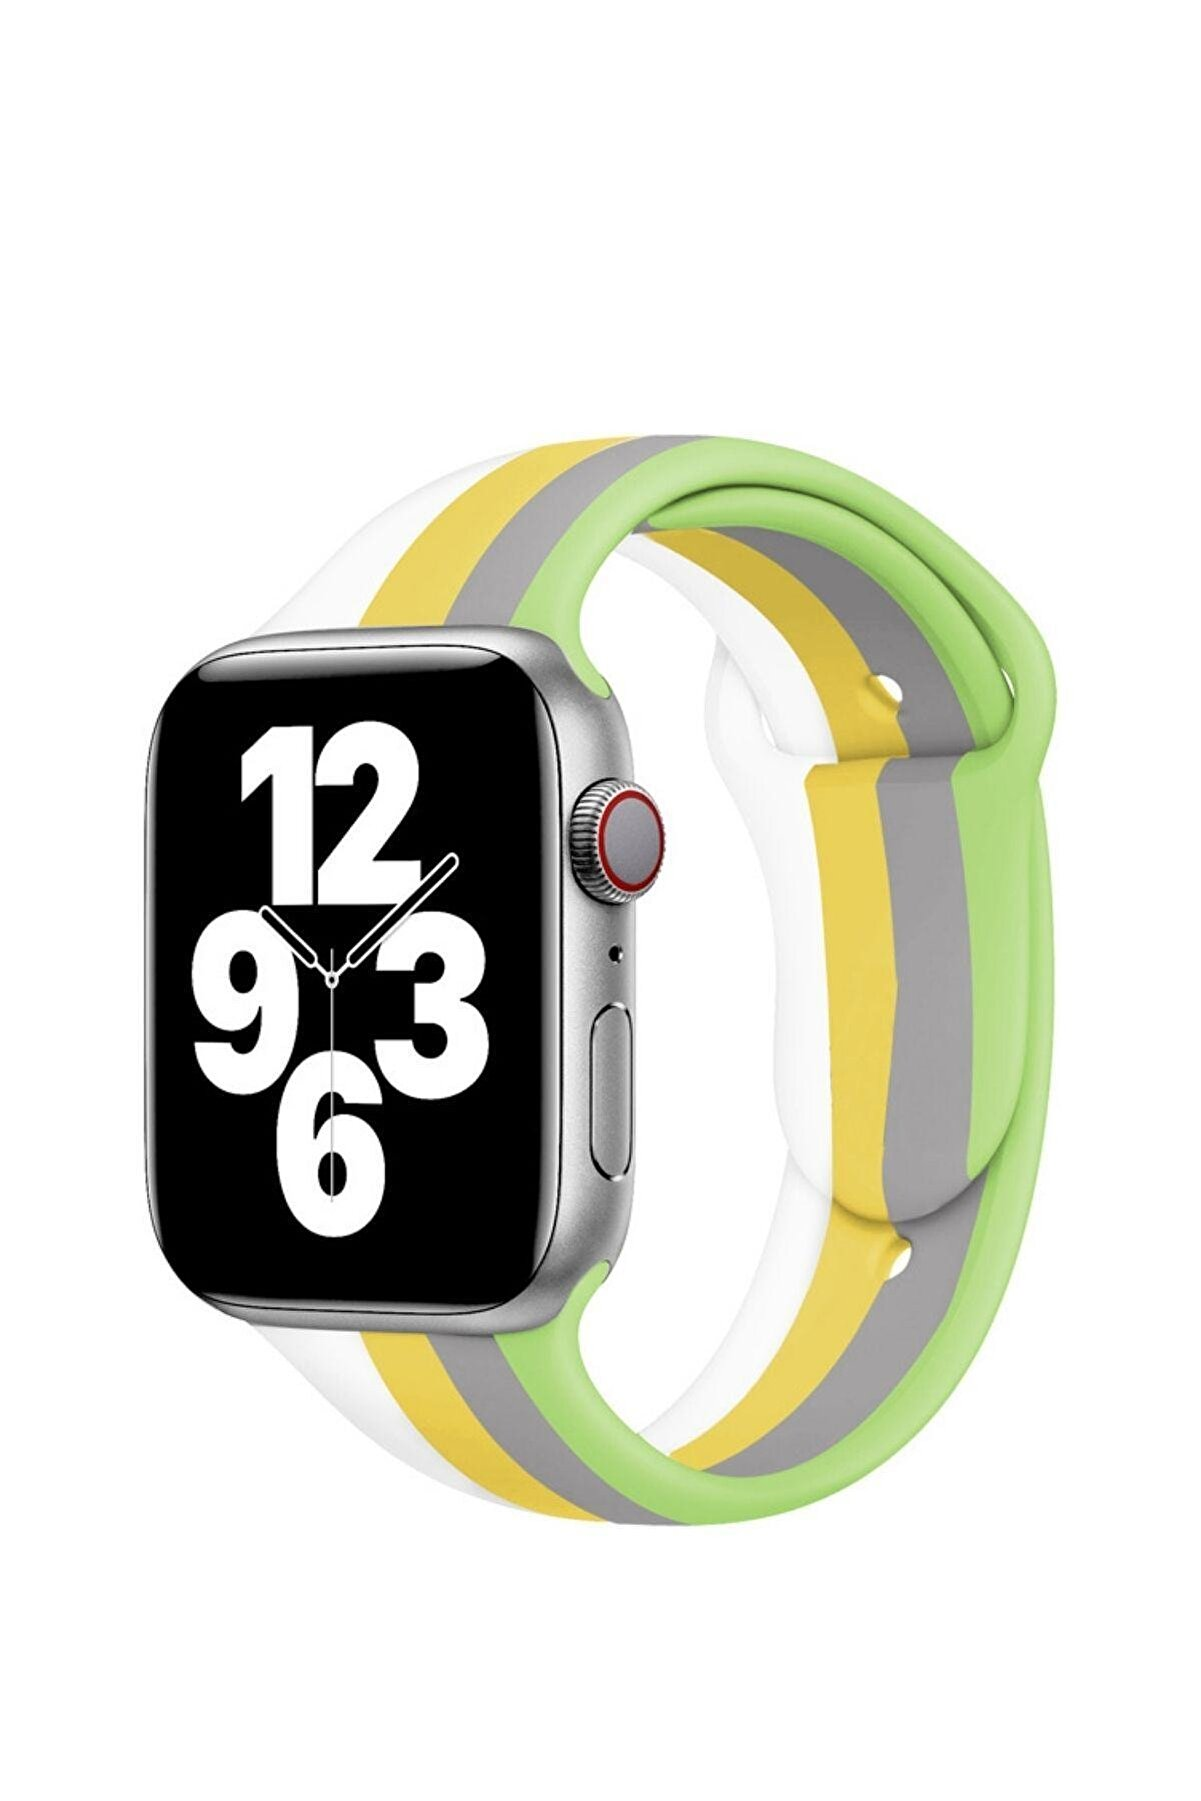 KVK PRİVACY Apple Watch 1-2-3-4-5-6-se Serisi ( 38mm - 40mm ) Uyumlu Renki Yeni Silikon Kordon